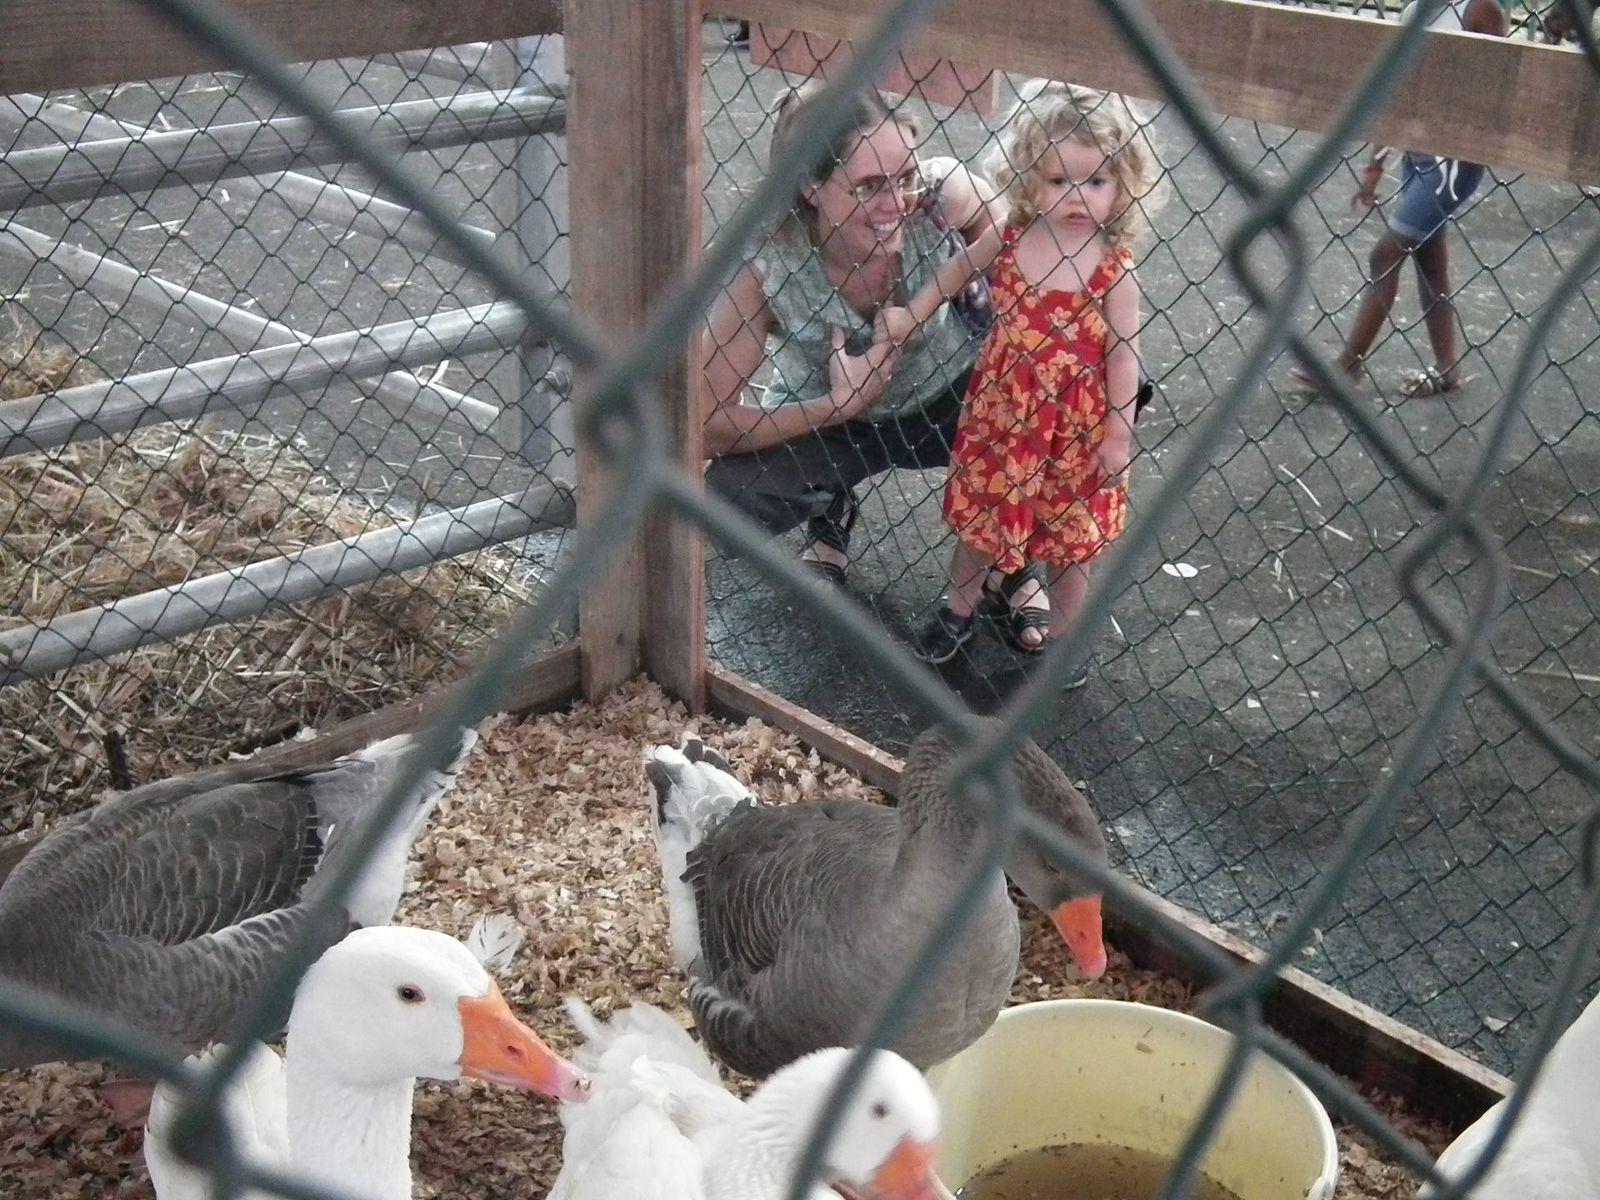 Madonie rend visite aux animaux